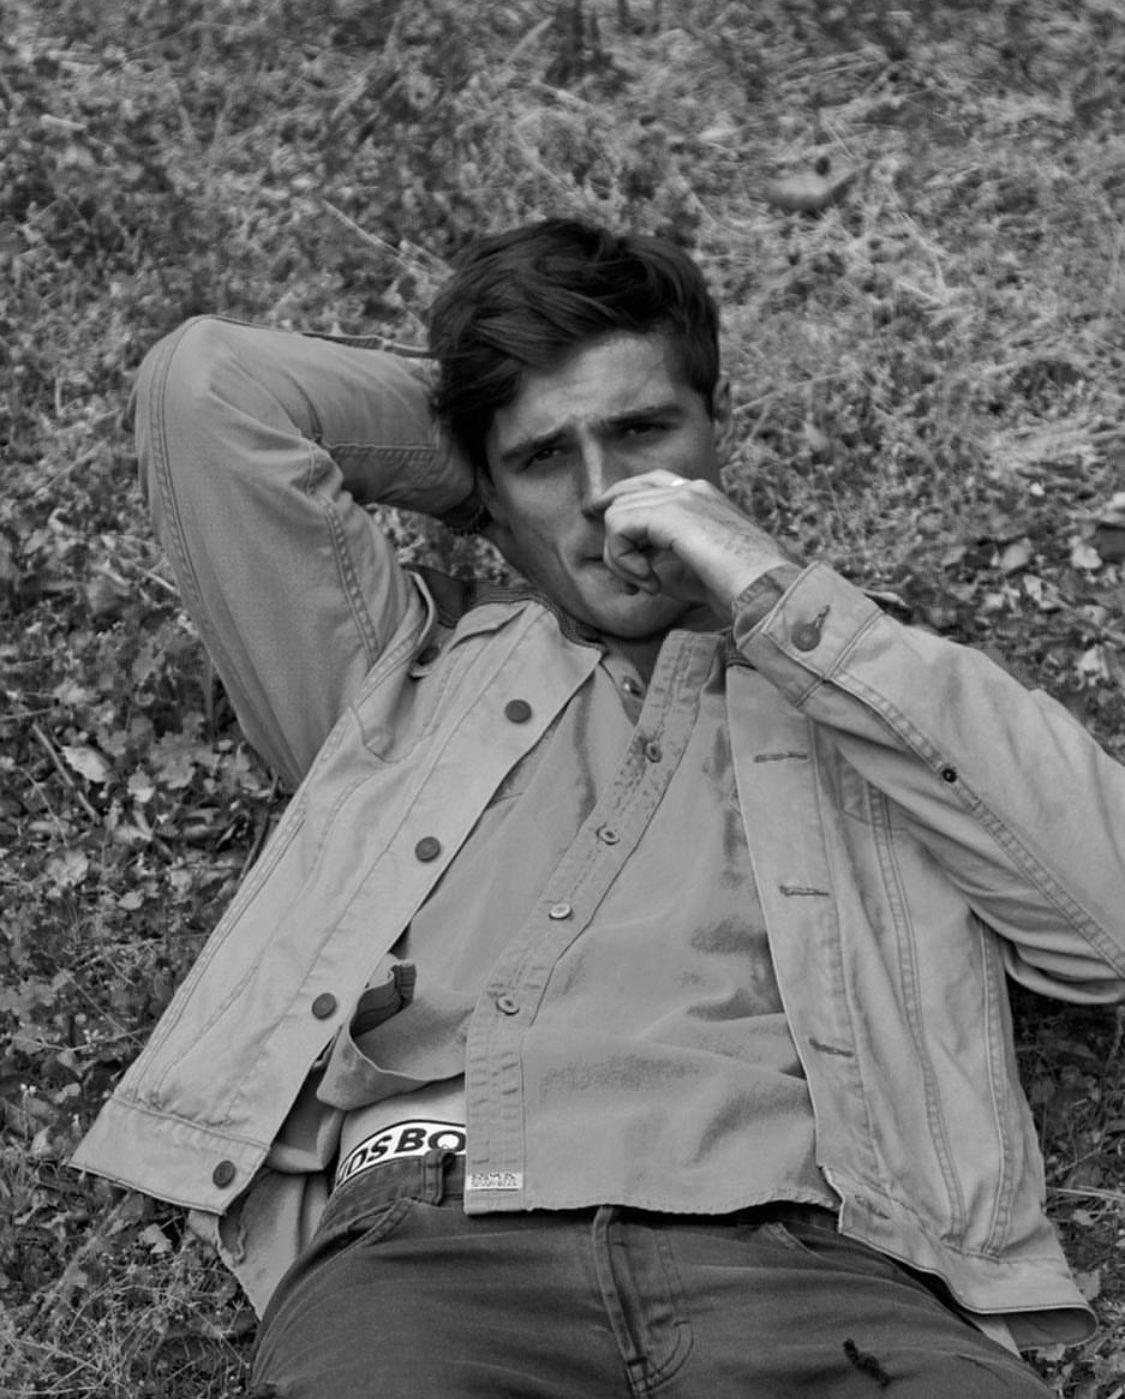 Jacob Elordi Looking Hot Com Imagens Barraca Do Beijo Filmes